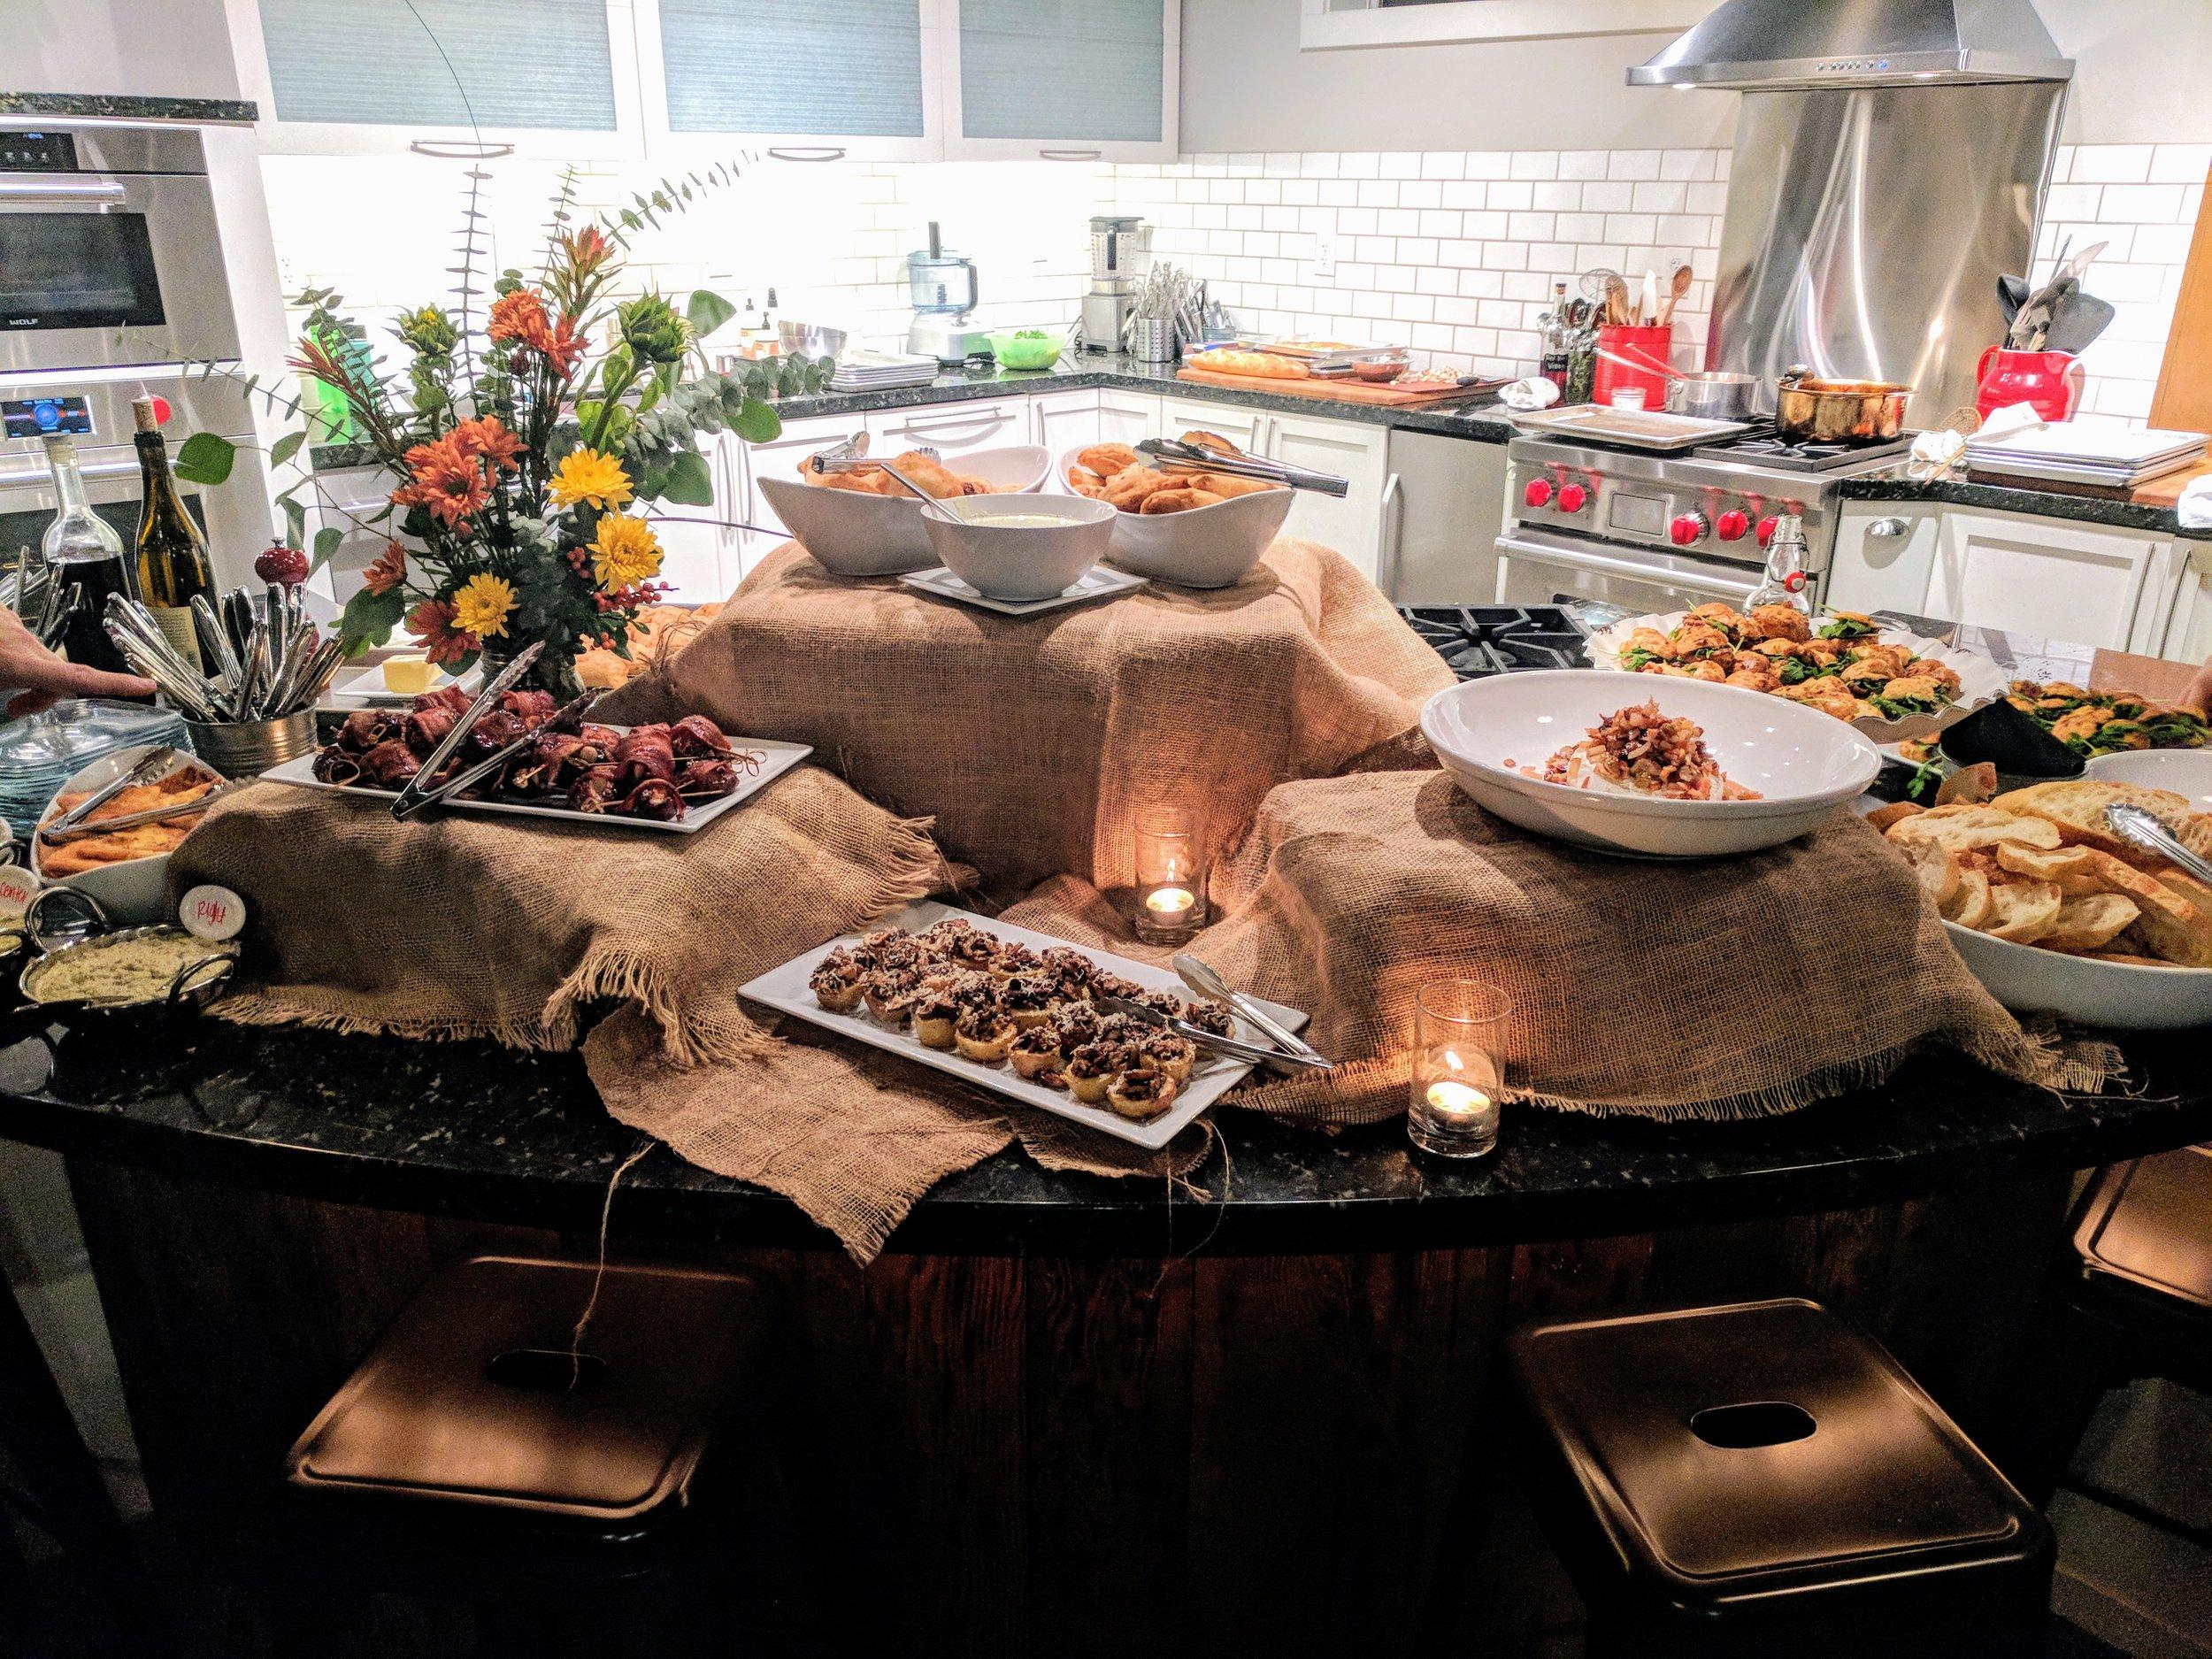 final-spread-kitchen-at-middleground-farms.jpg